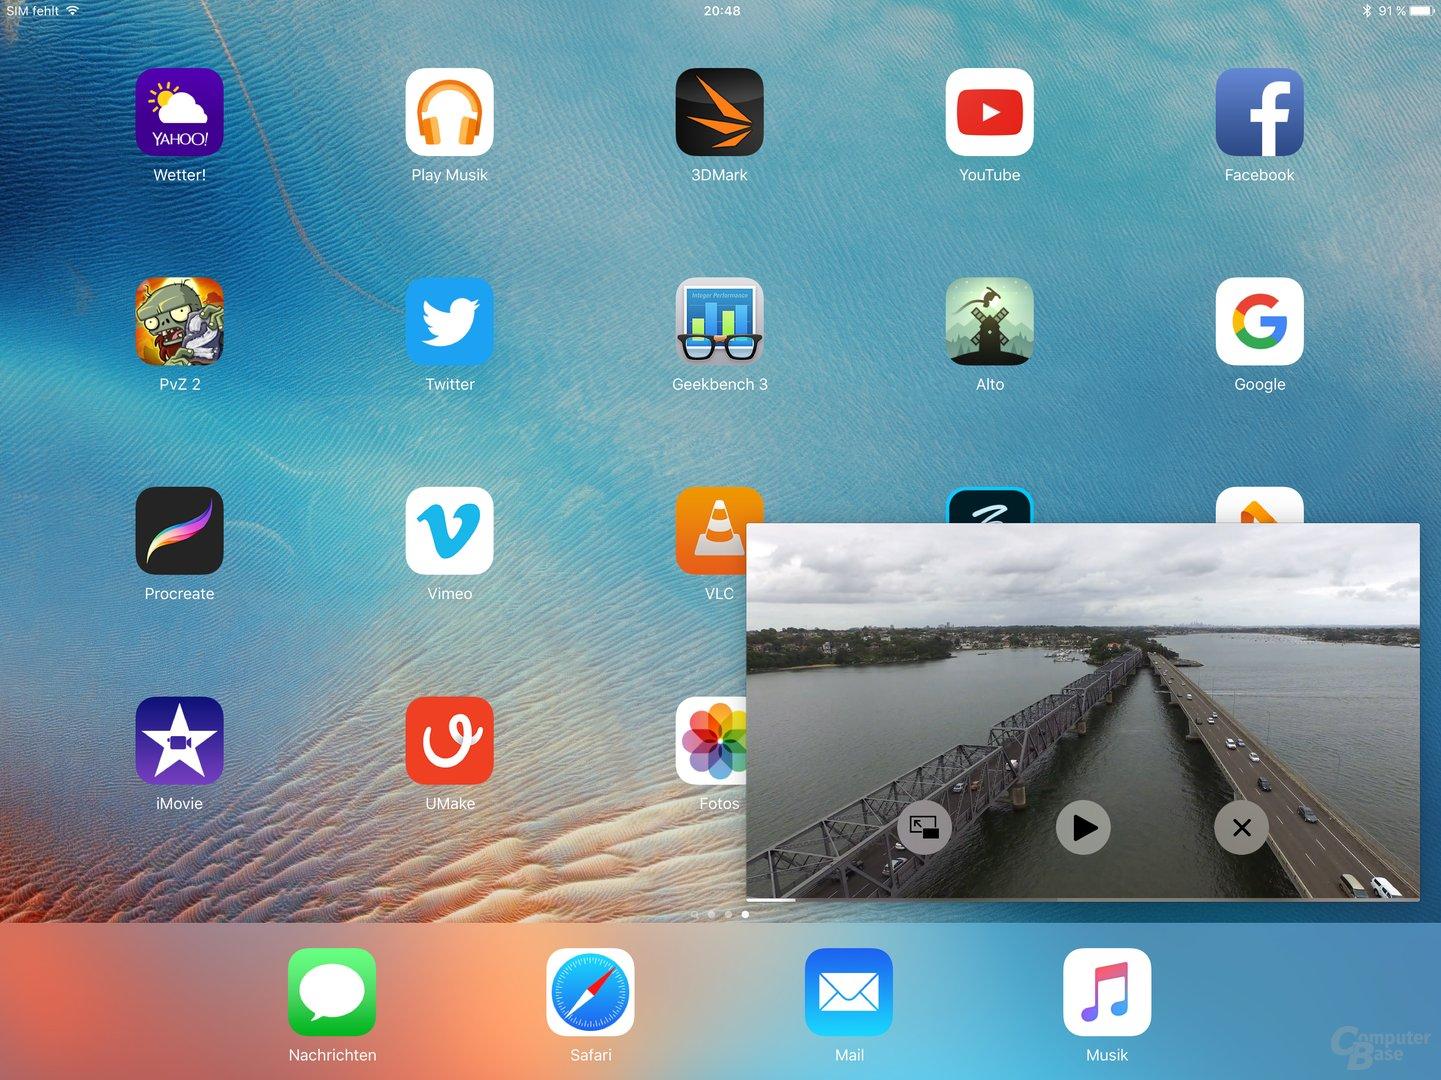 Bild im Bild aus iOS 9 auf dem iPad Pro